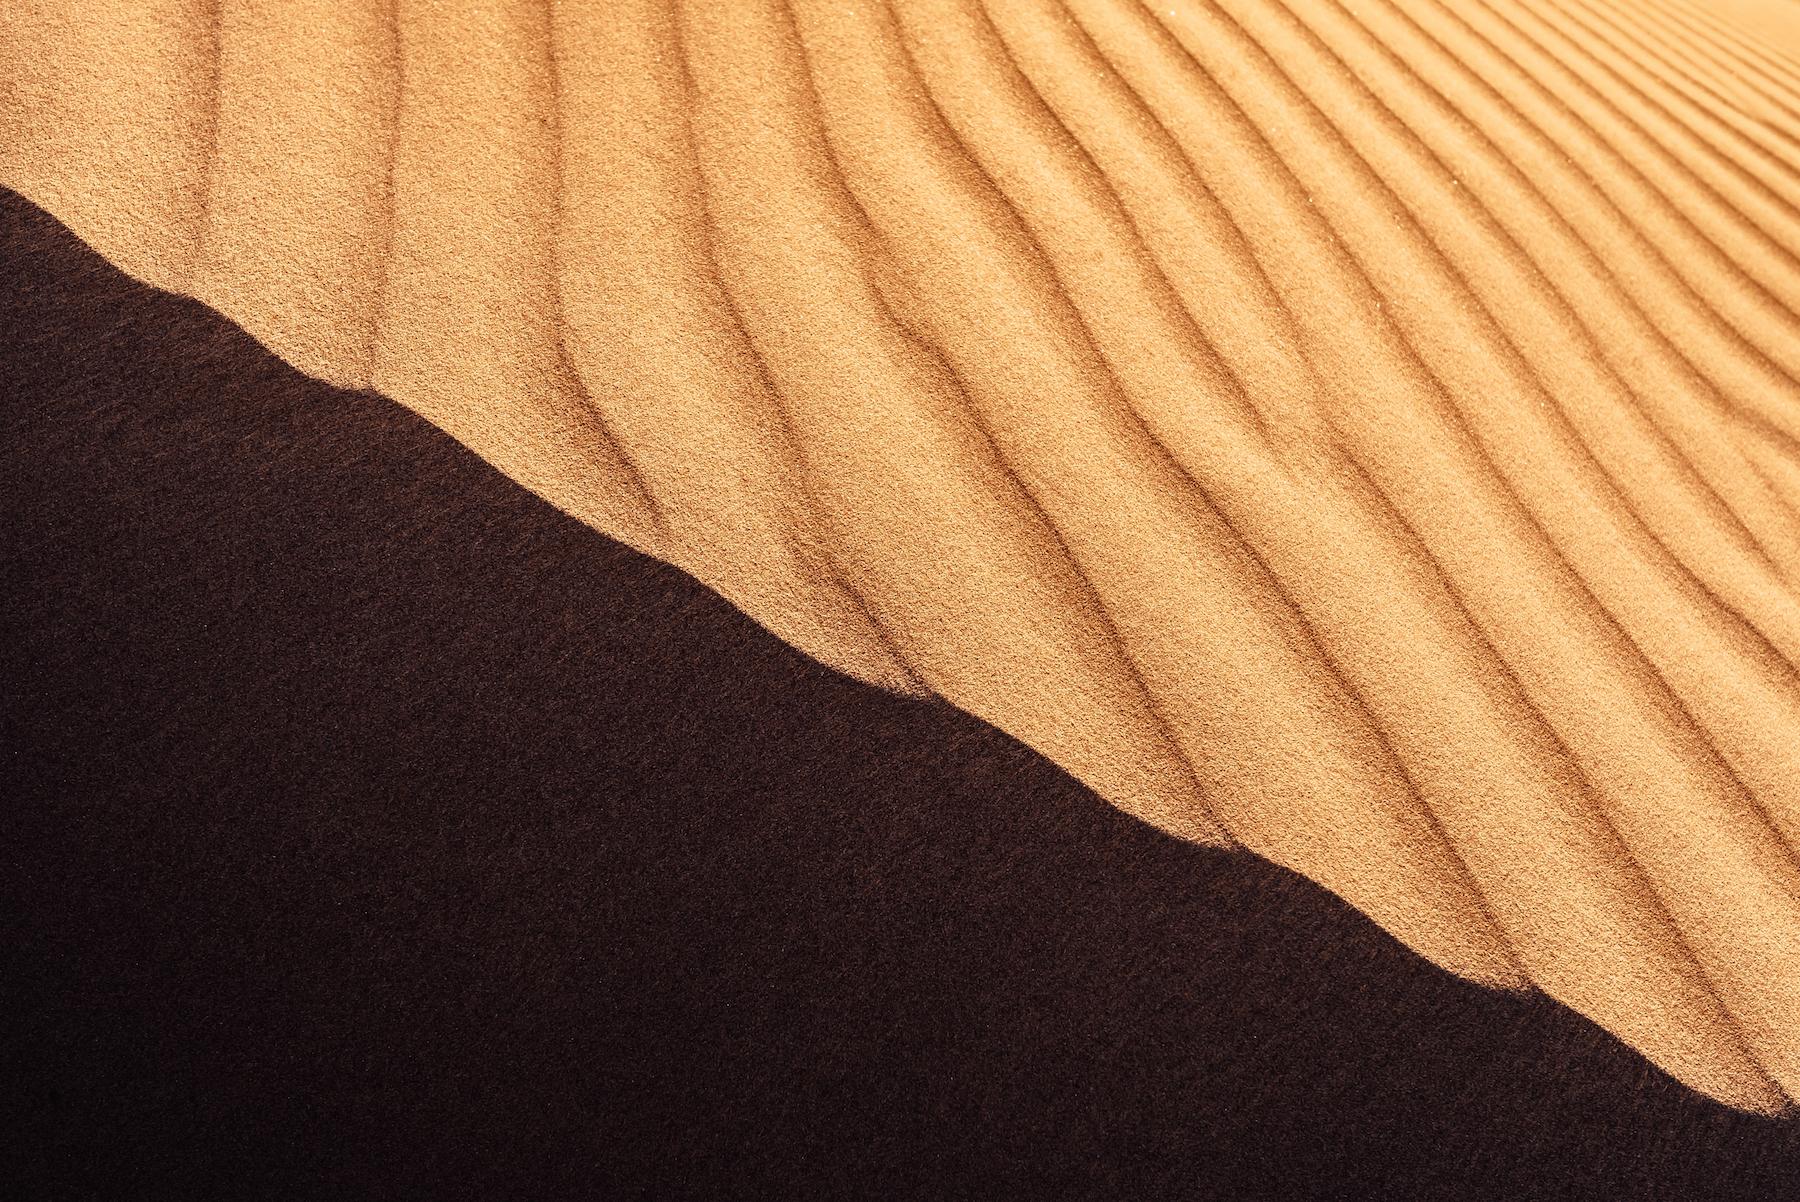 sand-dune-dubai-thomas-drouault-portfolio.jpg